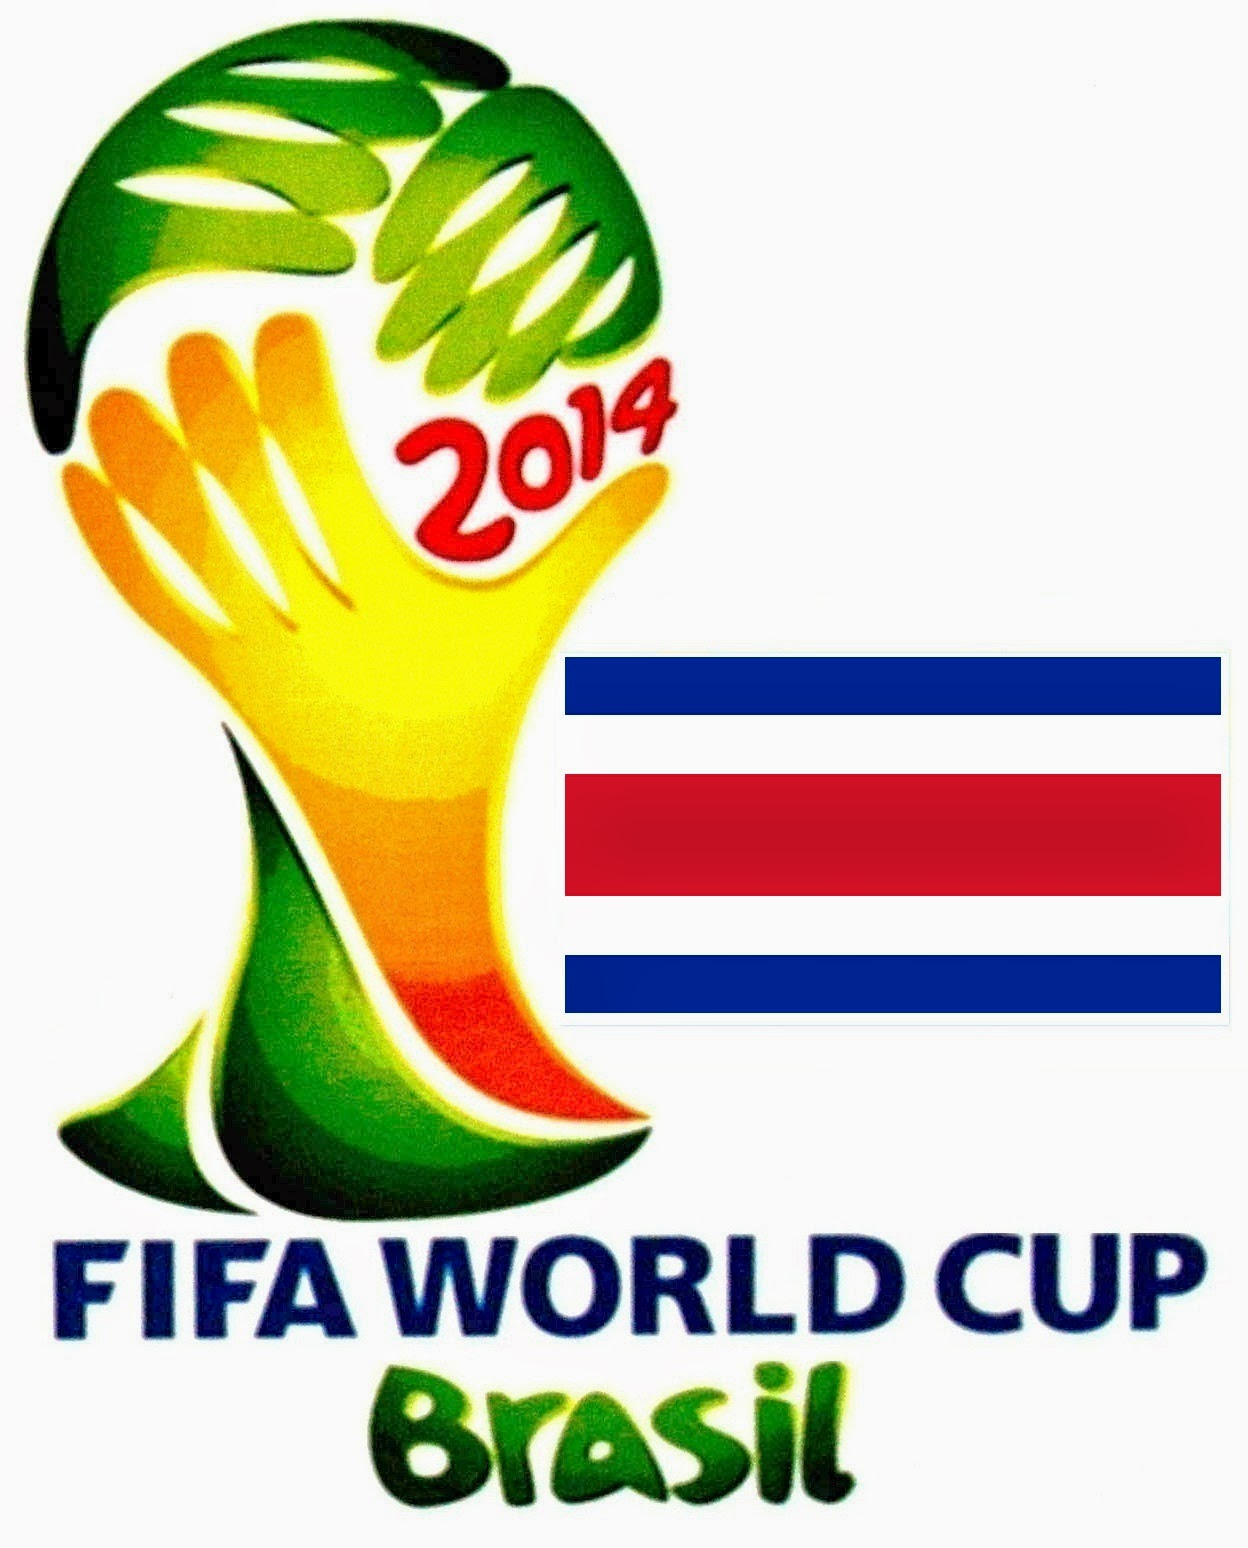 Daftar Nama Pemain Timnas Kosta Rika Piala Dunia 2014